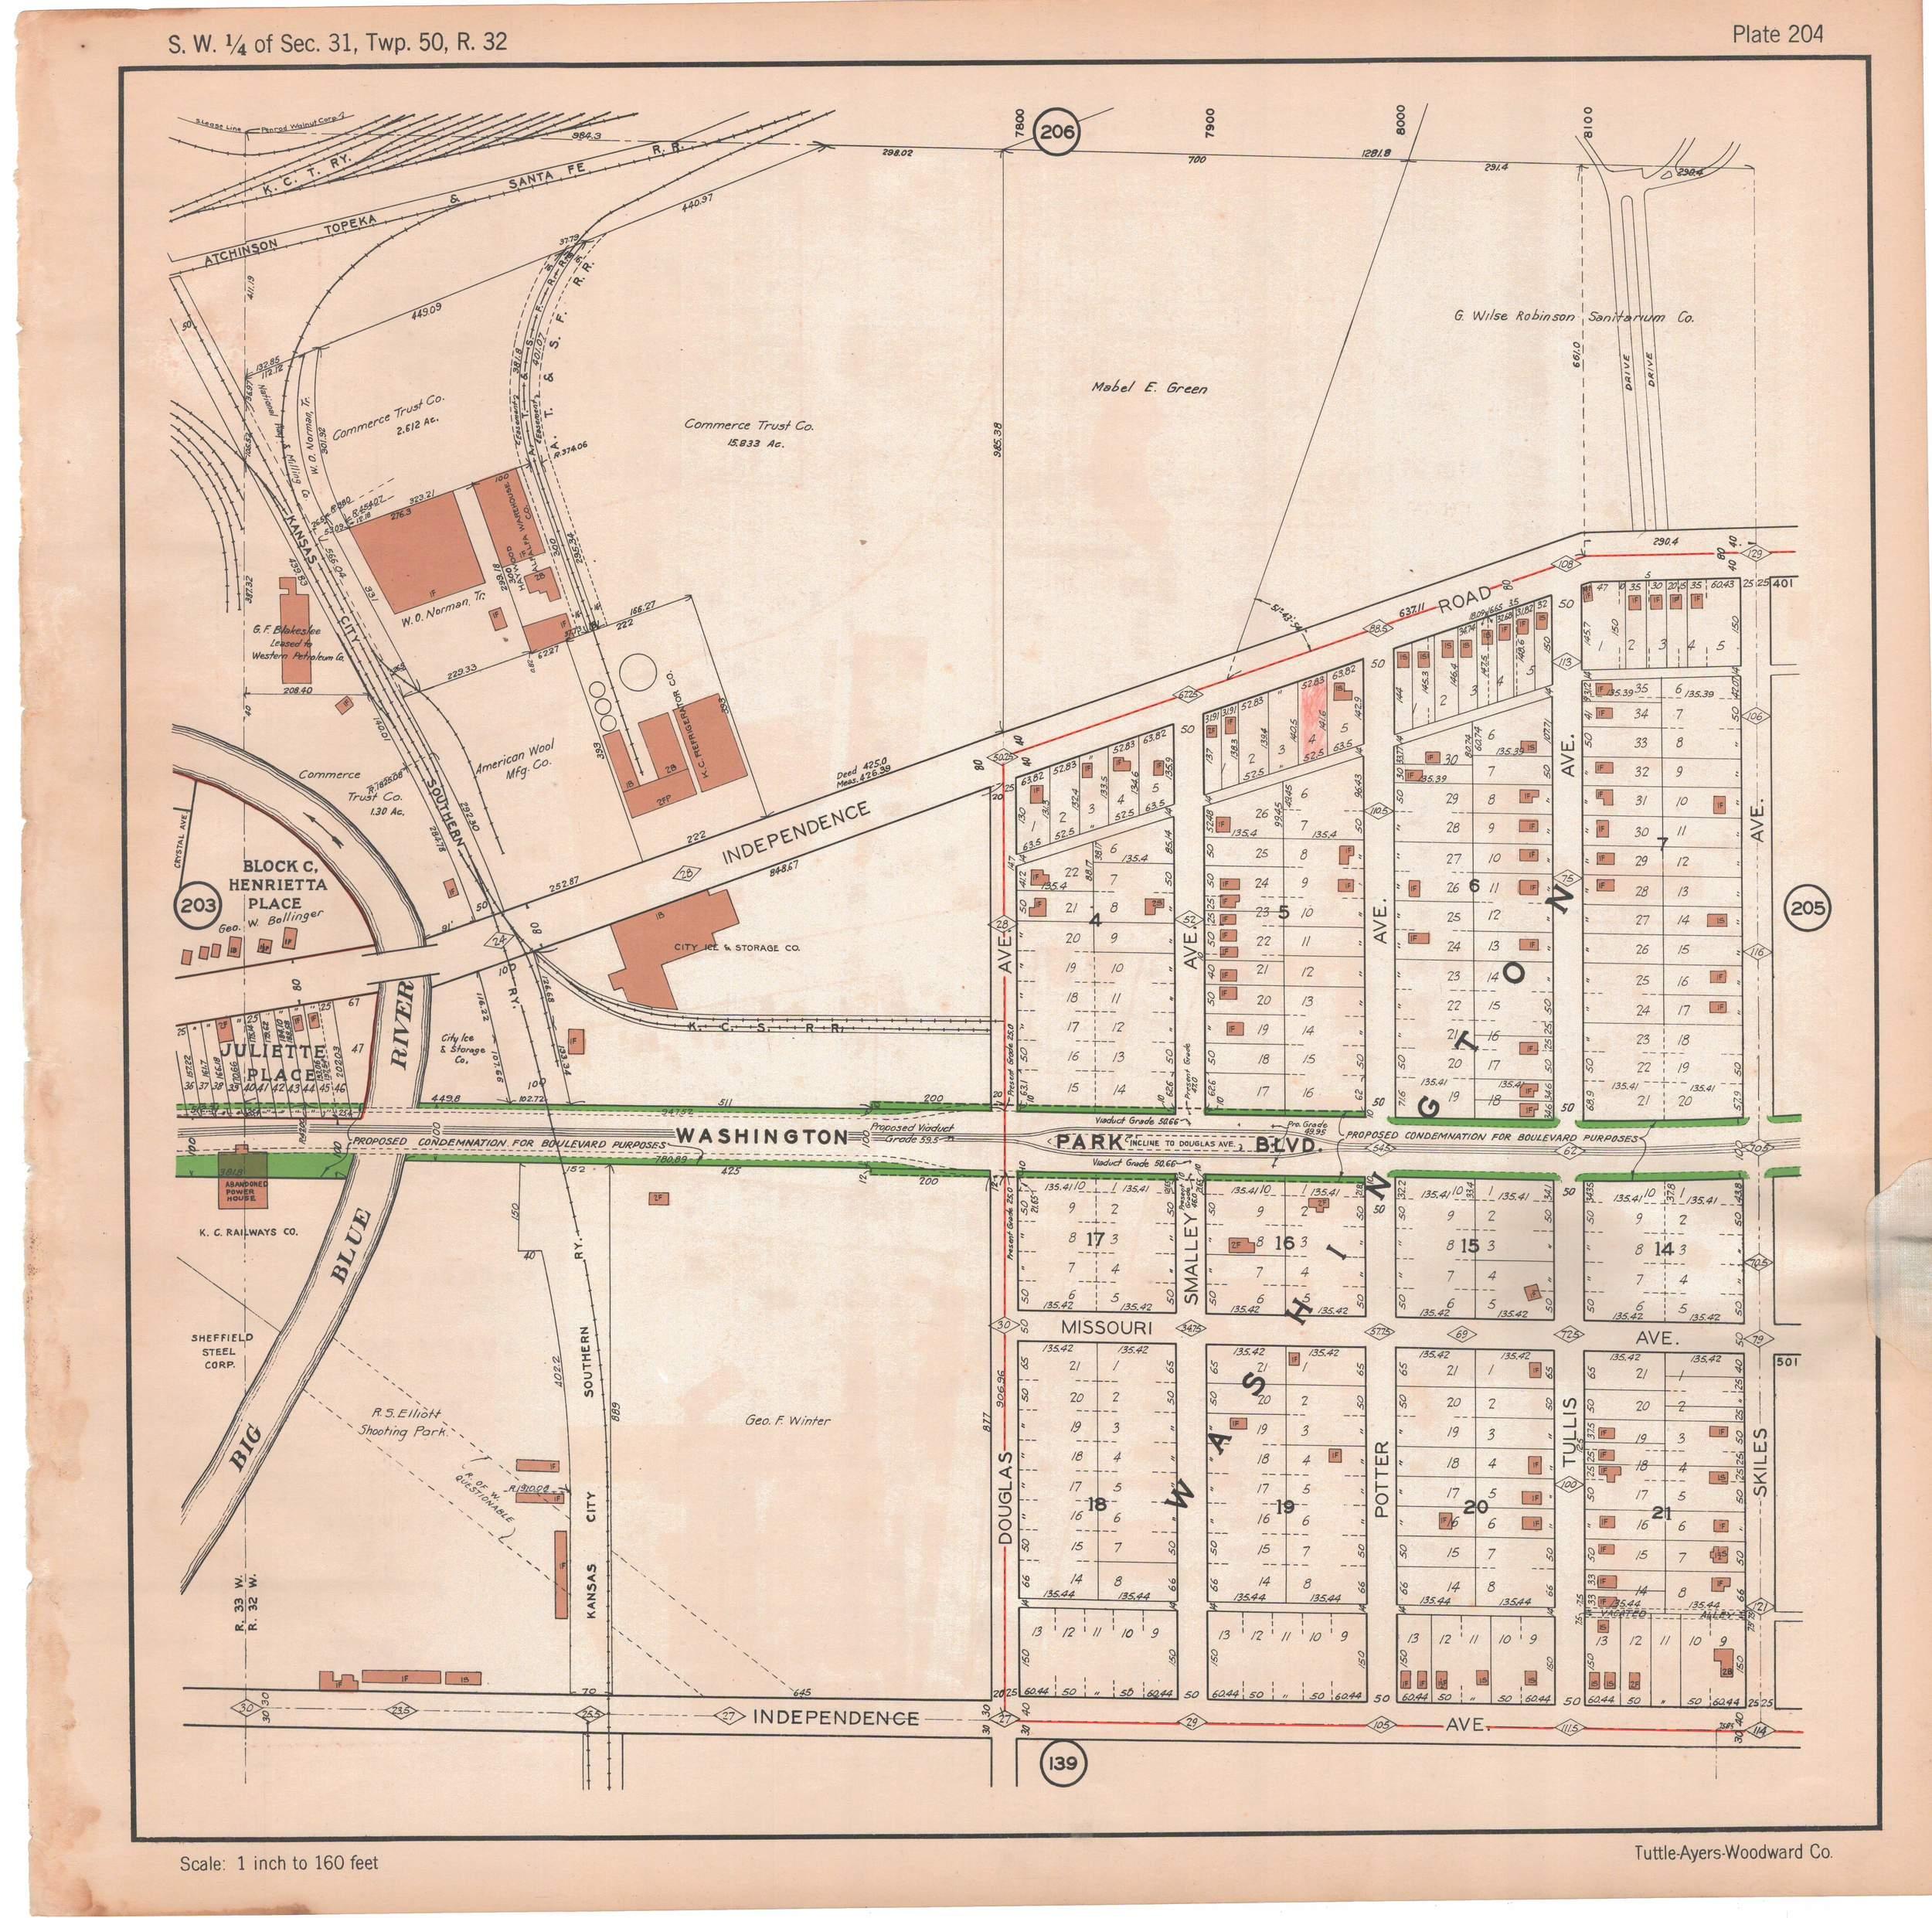 1925 TUTTLE_AYERS_Plate_204.JPG